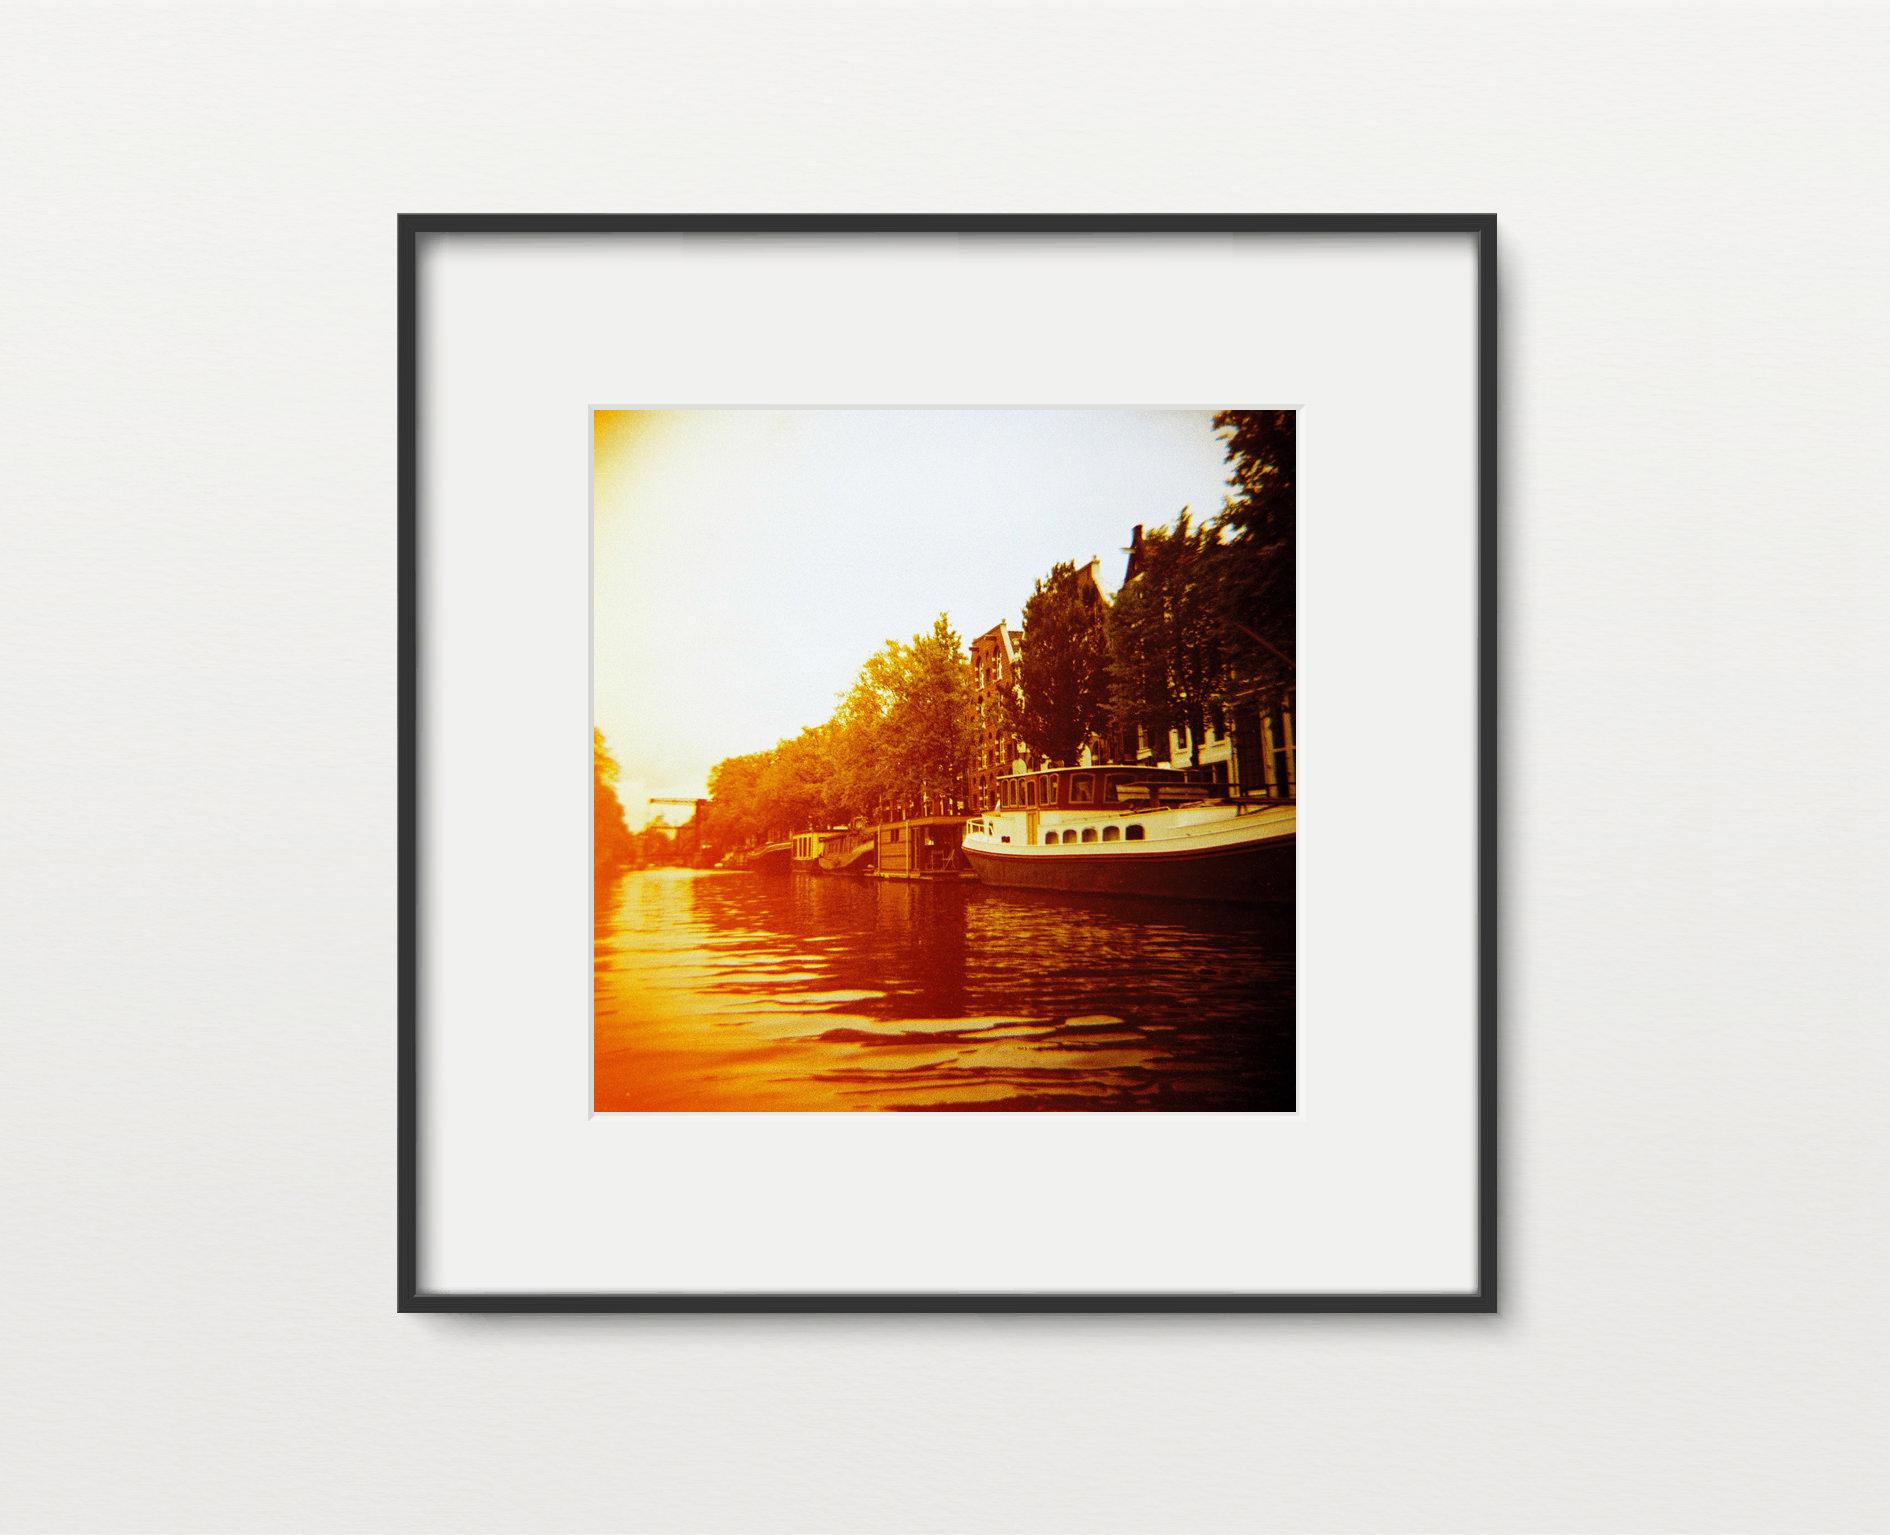 Golden Amsterdam Print